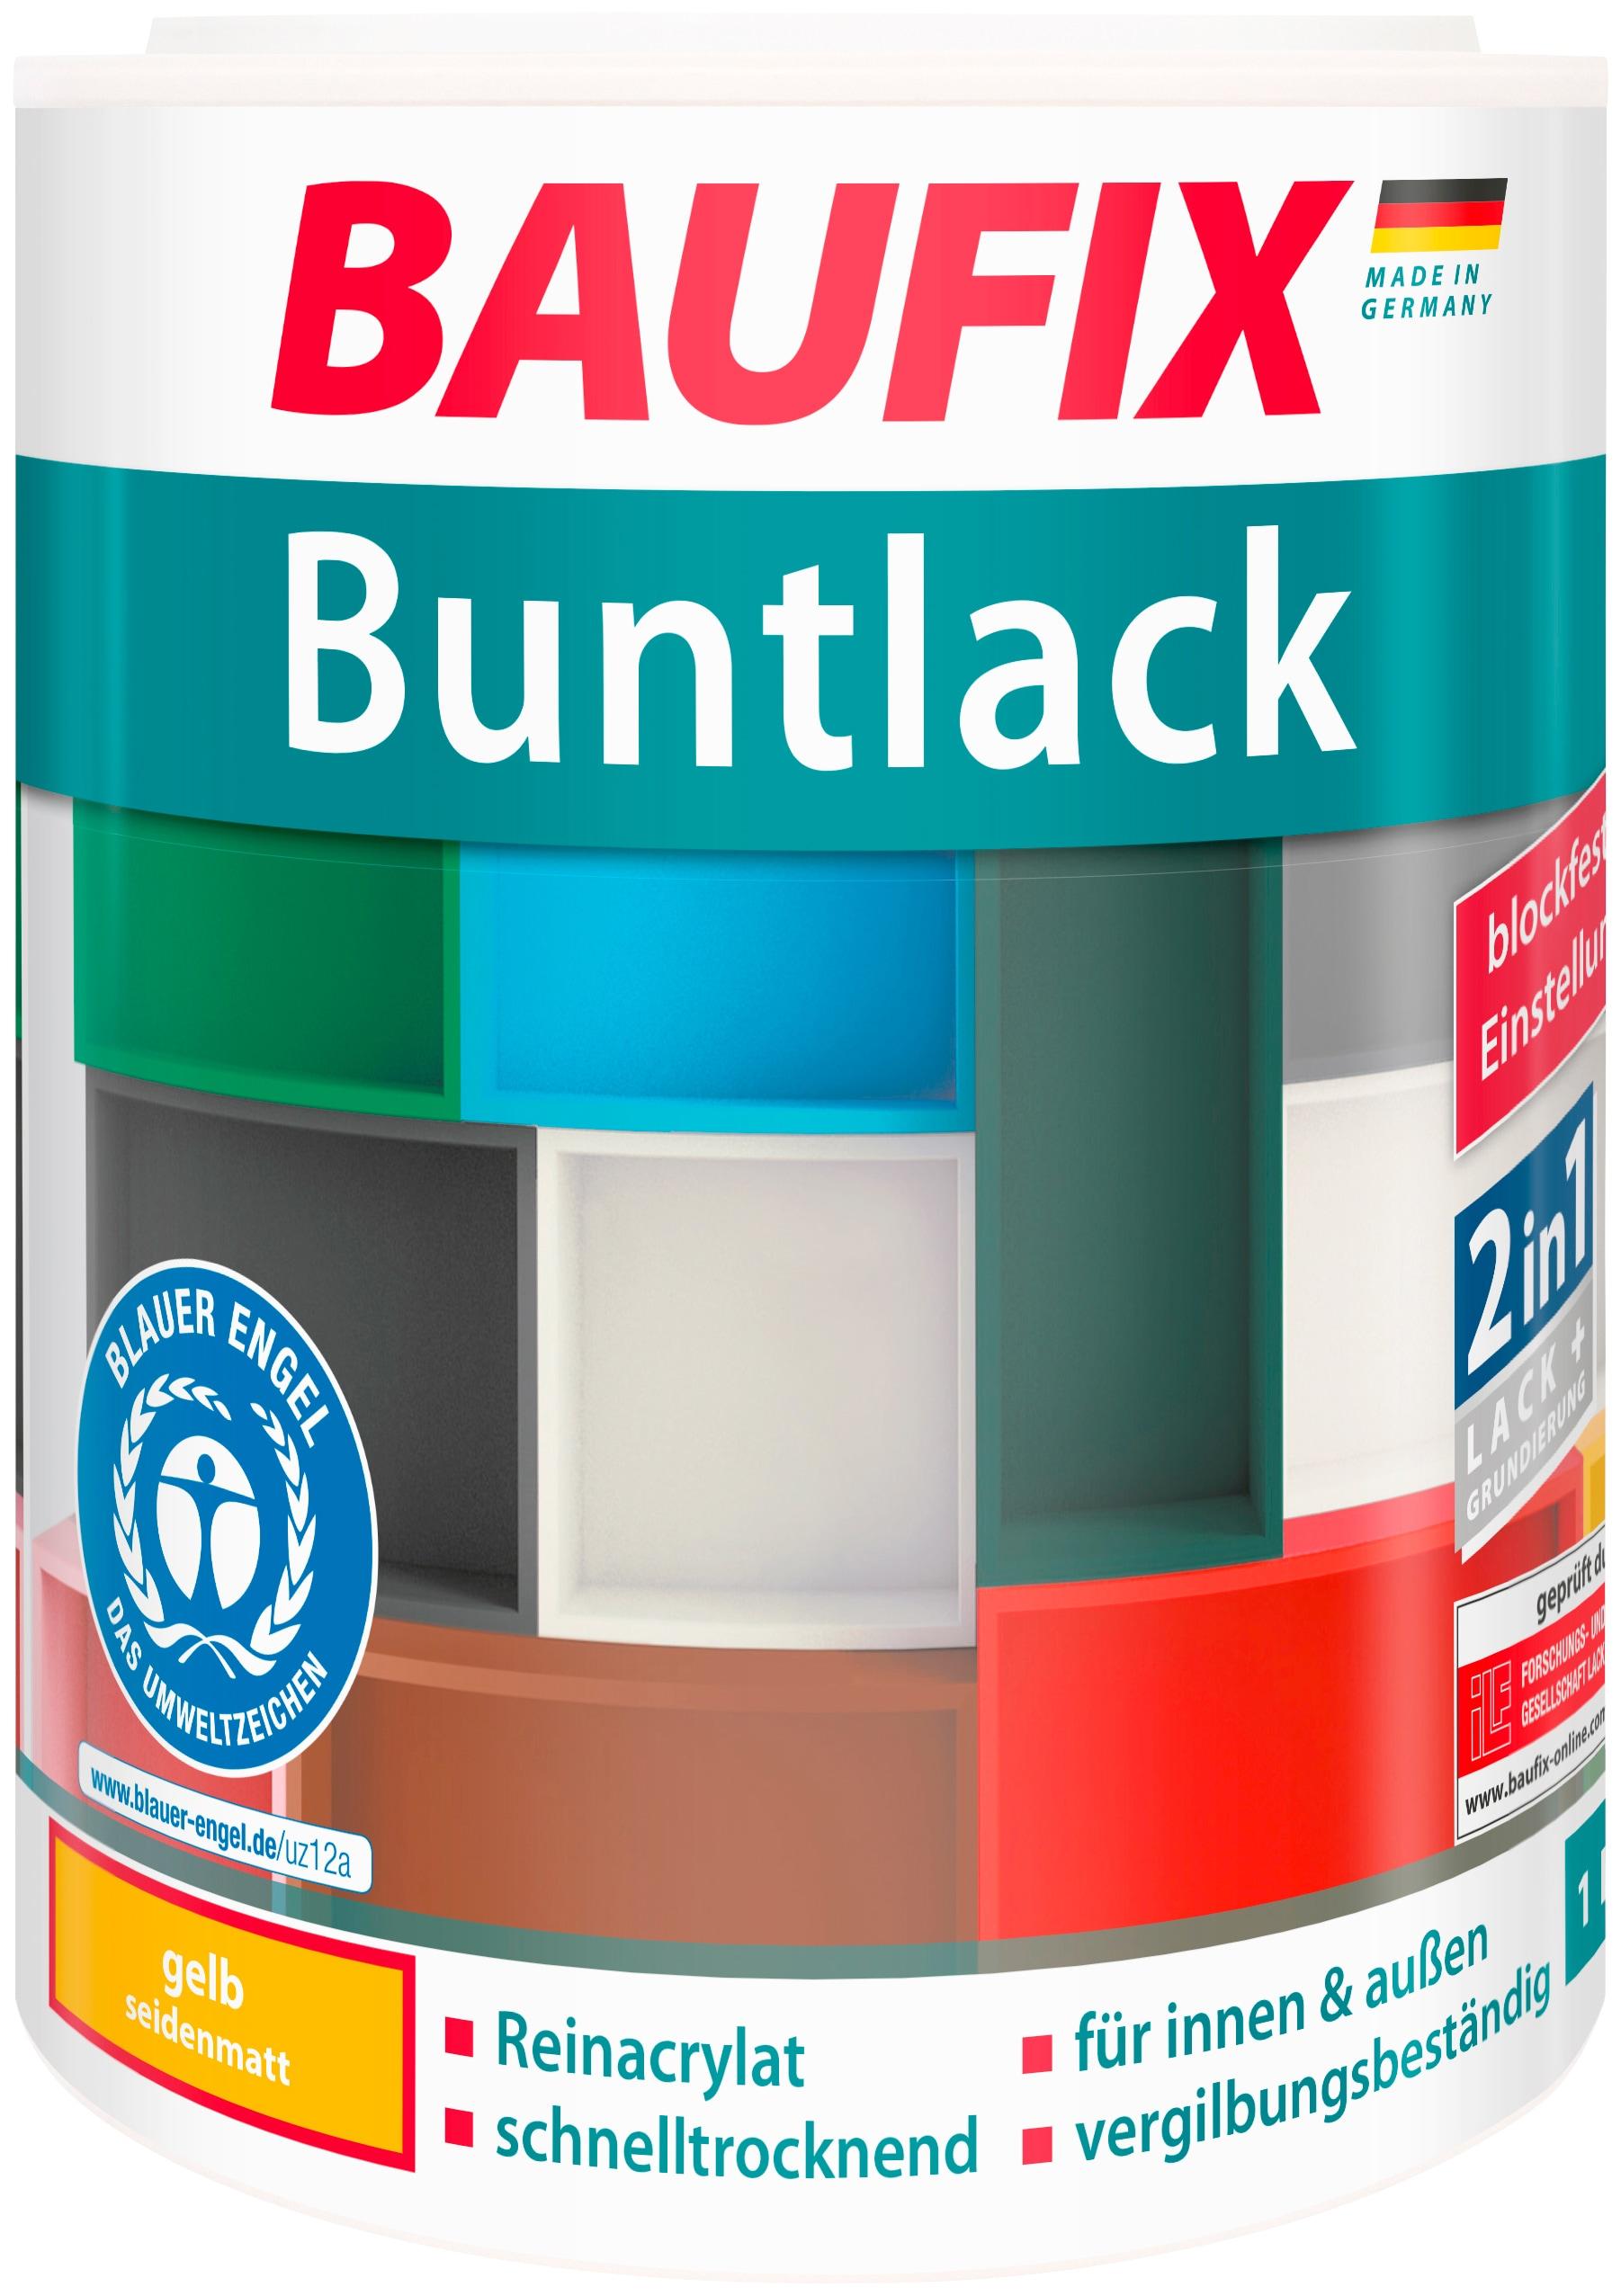 Baufix Acryl-Buntlack, 1 Liter, gelb Lacke Farben Bauen Renovieren Acryl-Buntlack